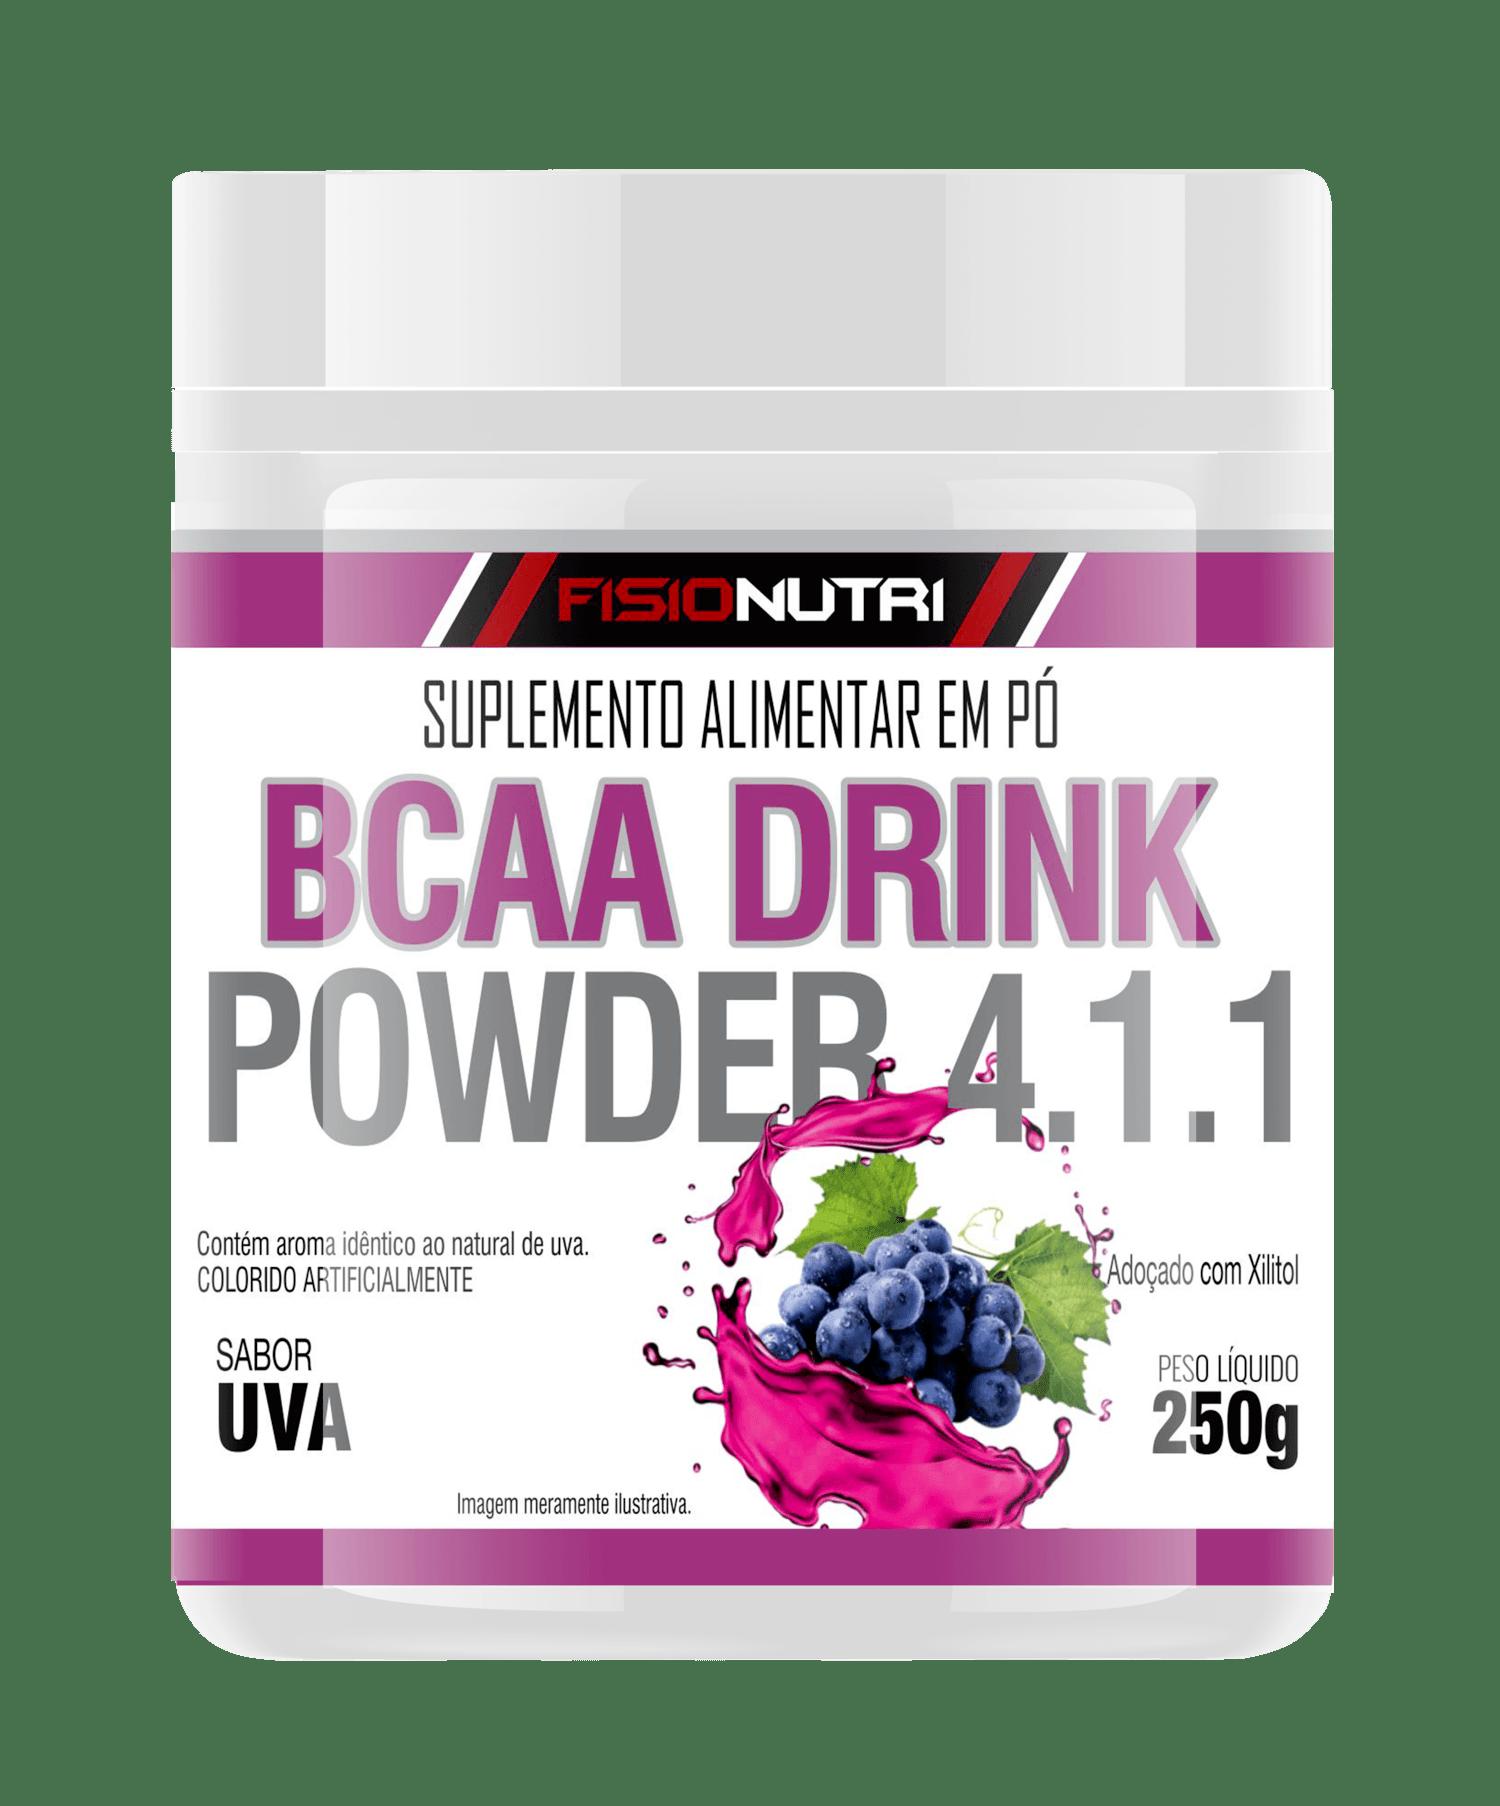 BCAA DRINK POWDER 4.1.1 EM PÓ SABOR UVA